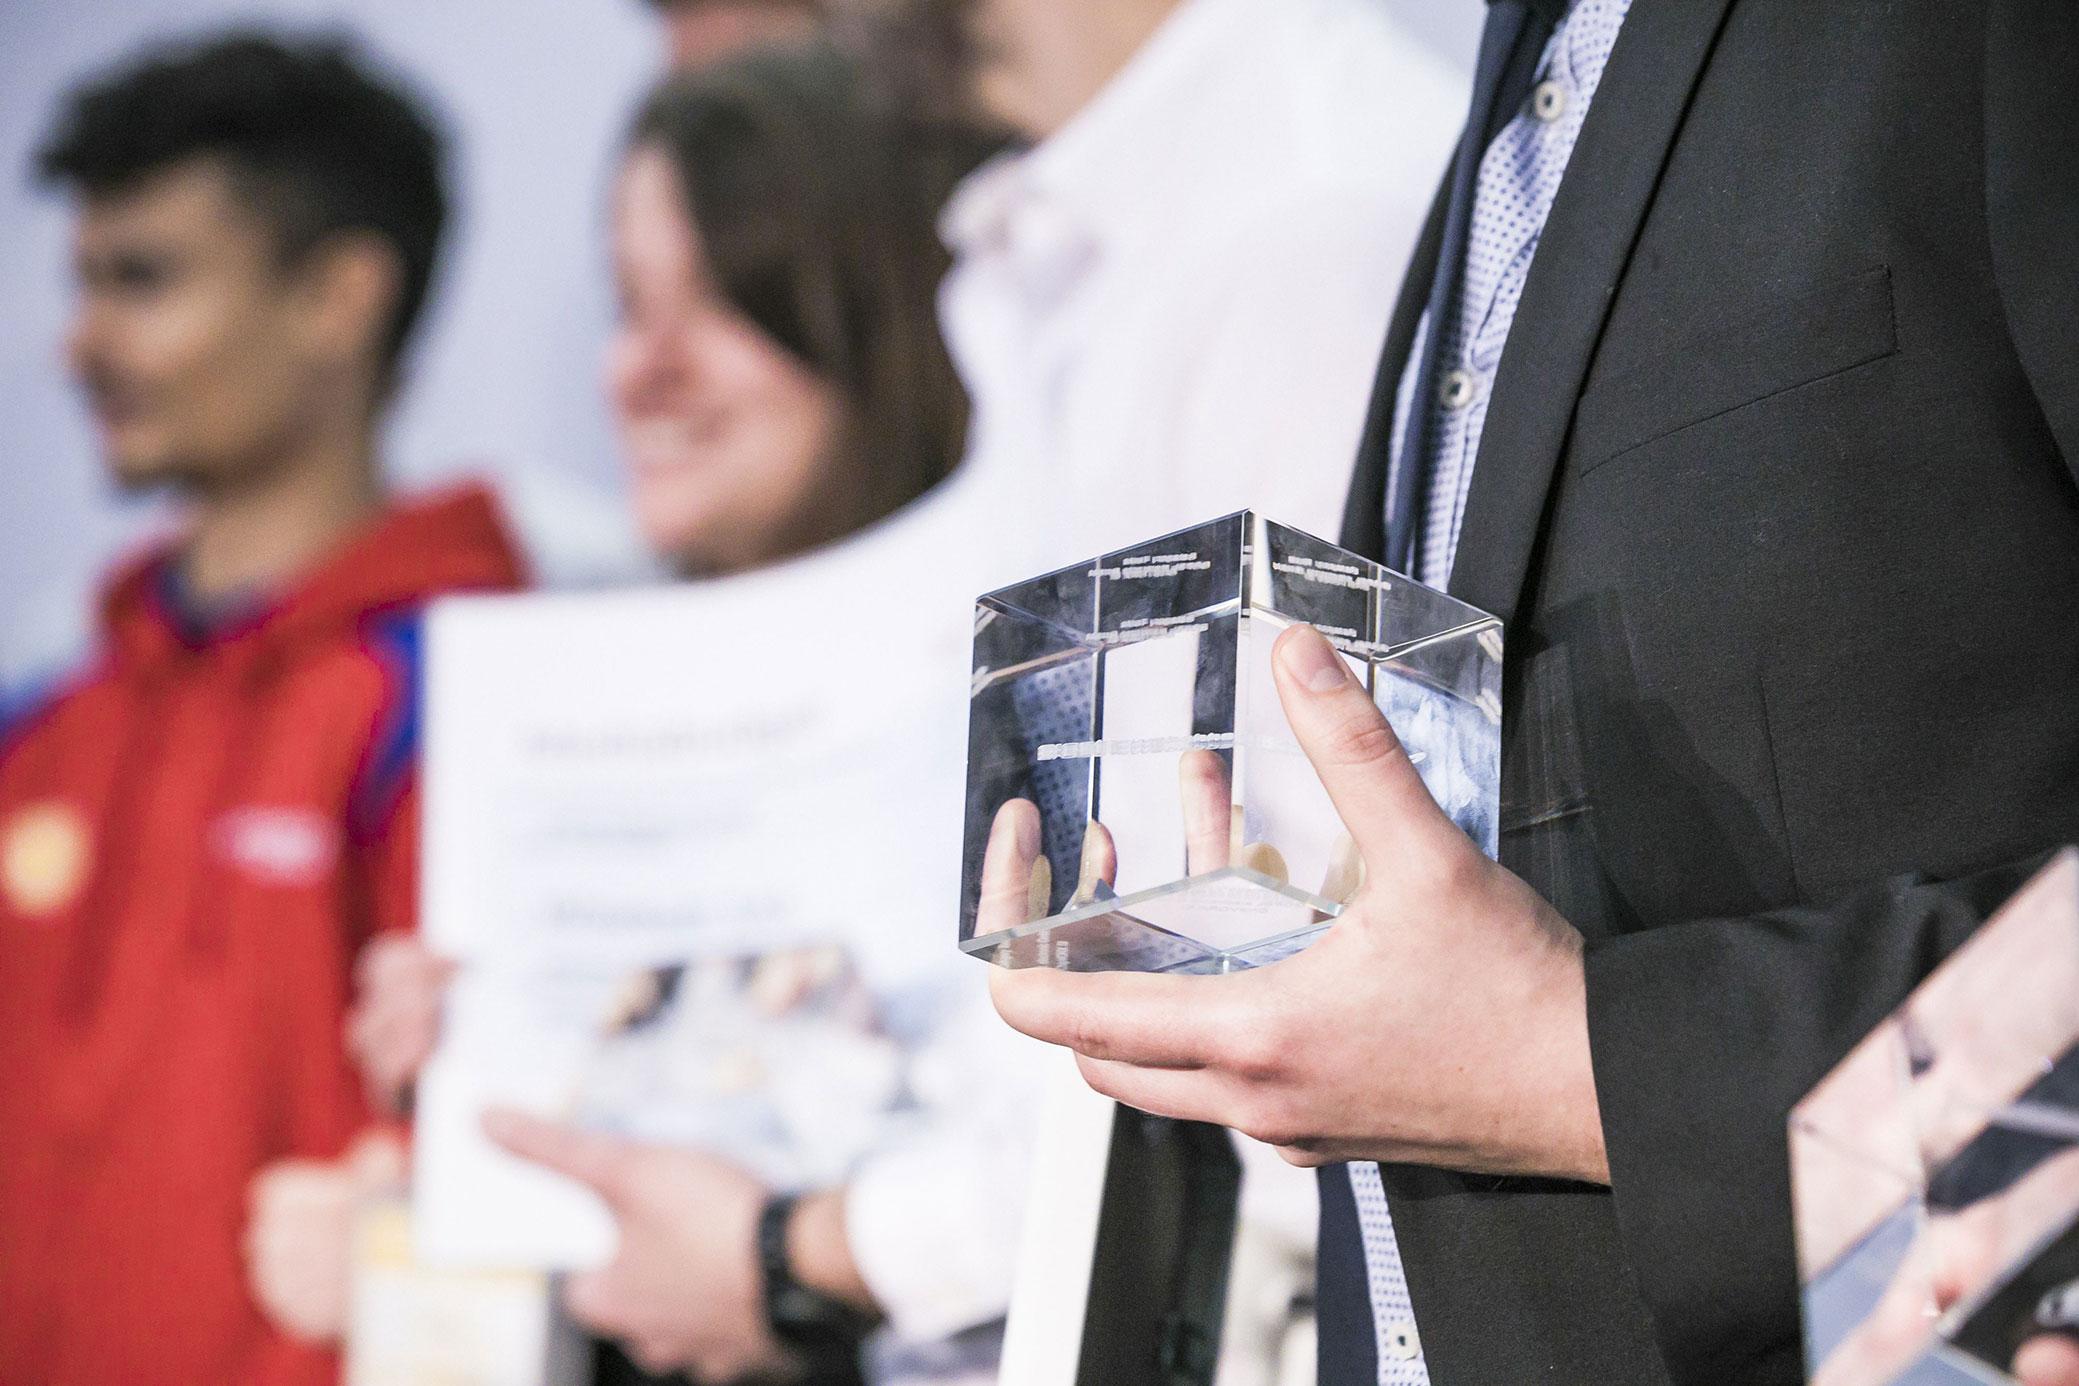 Verleihung embedded award